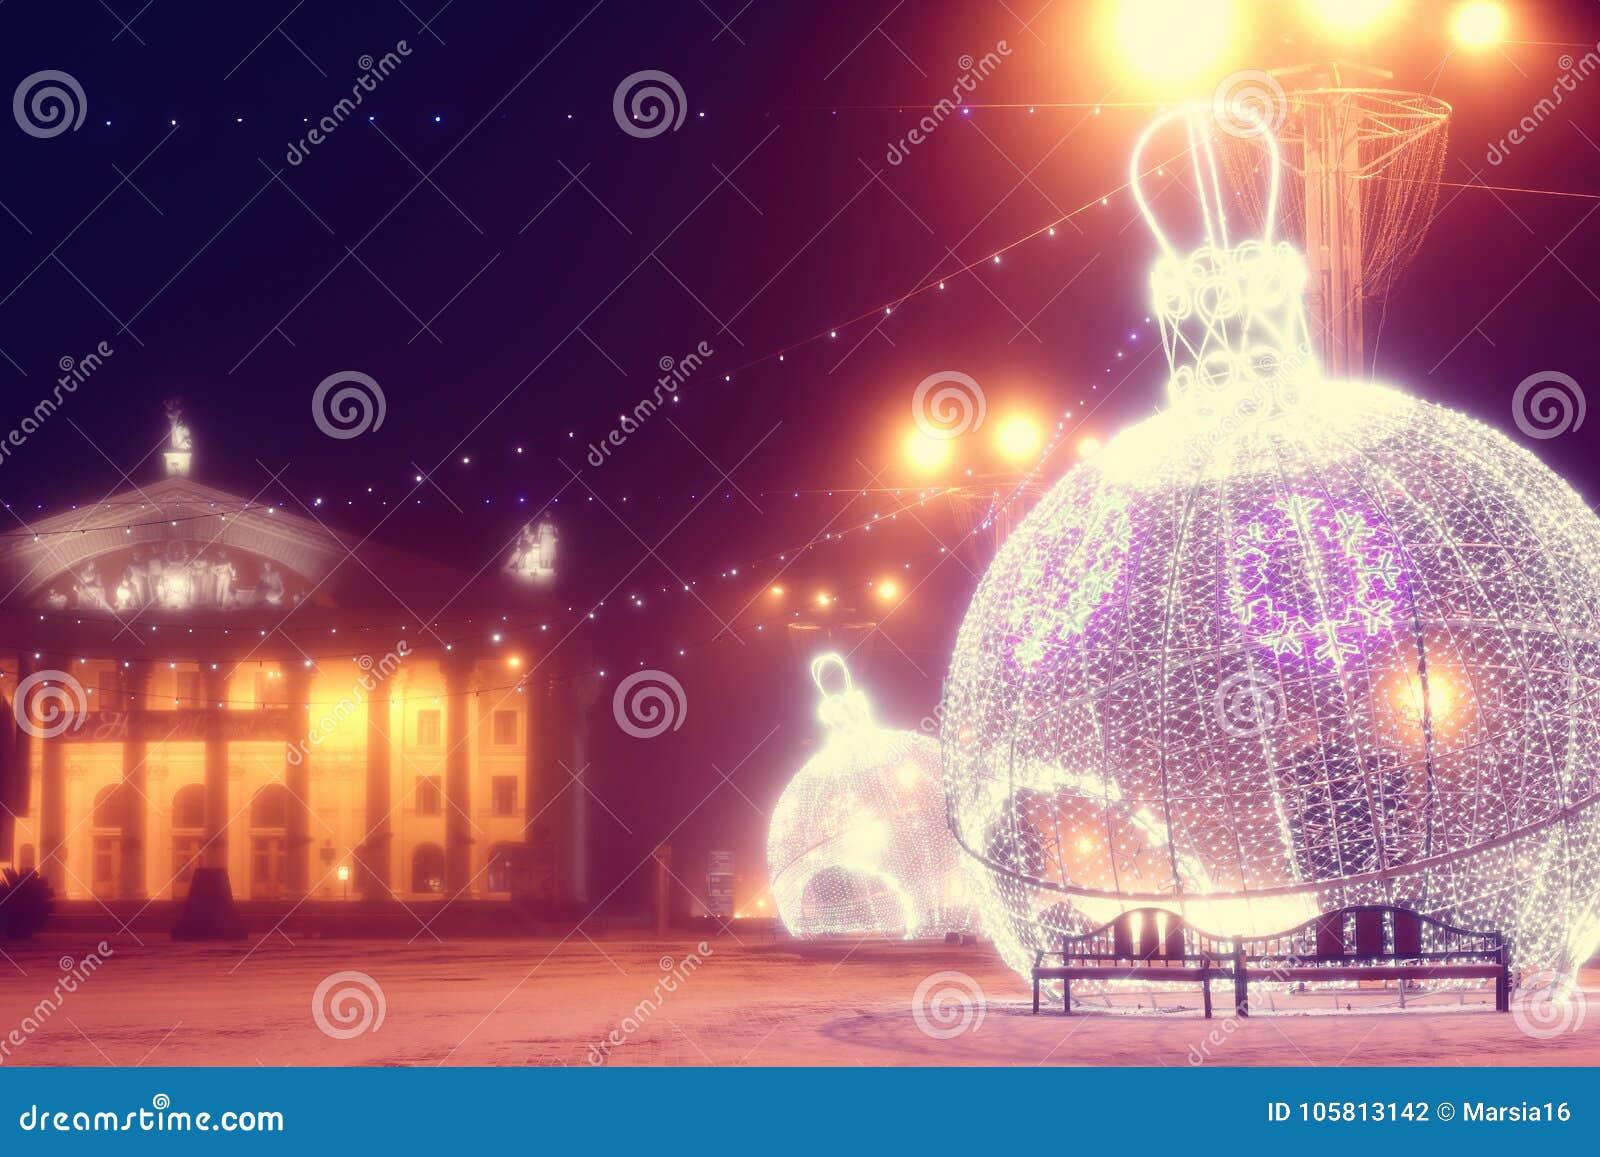 Night scene with illuminated Christmas balls and theater